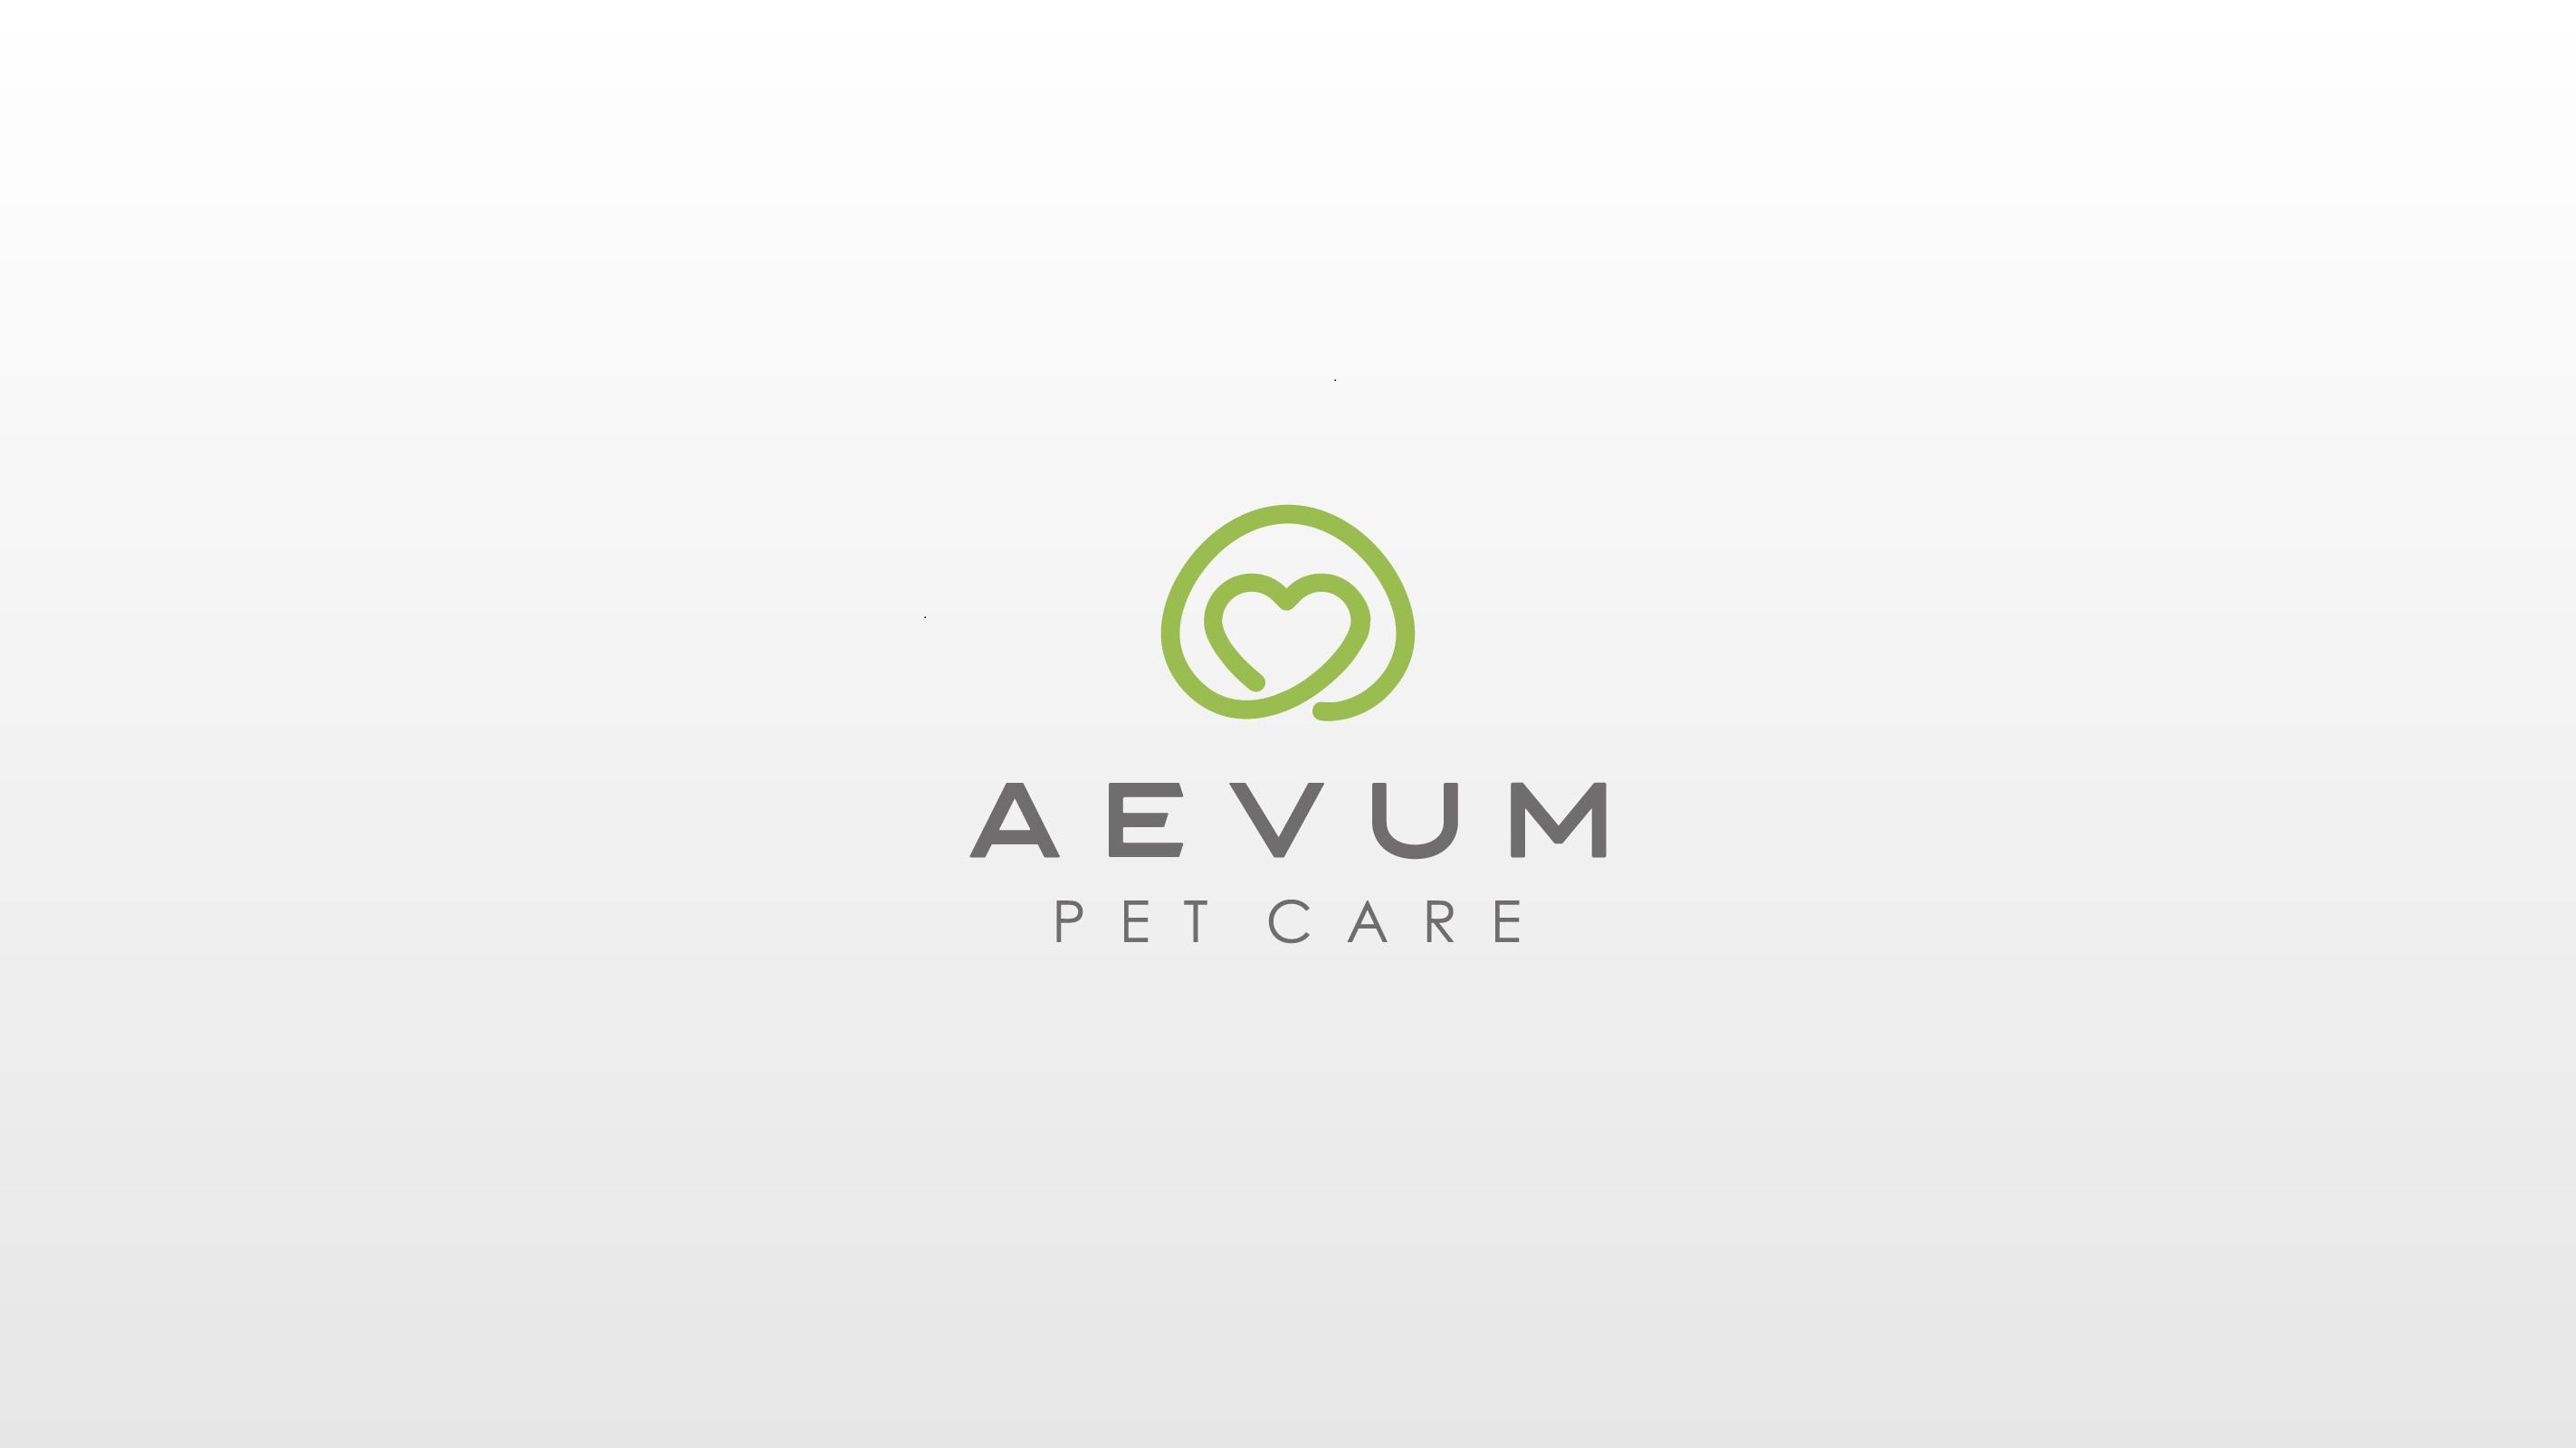 AEVUM PET CARE doo